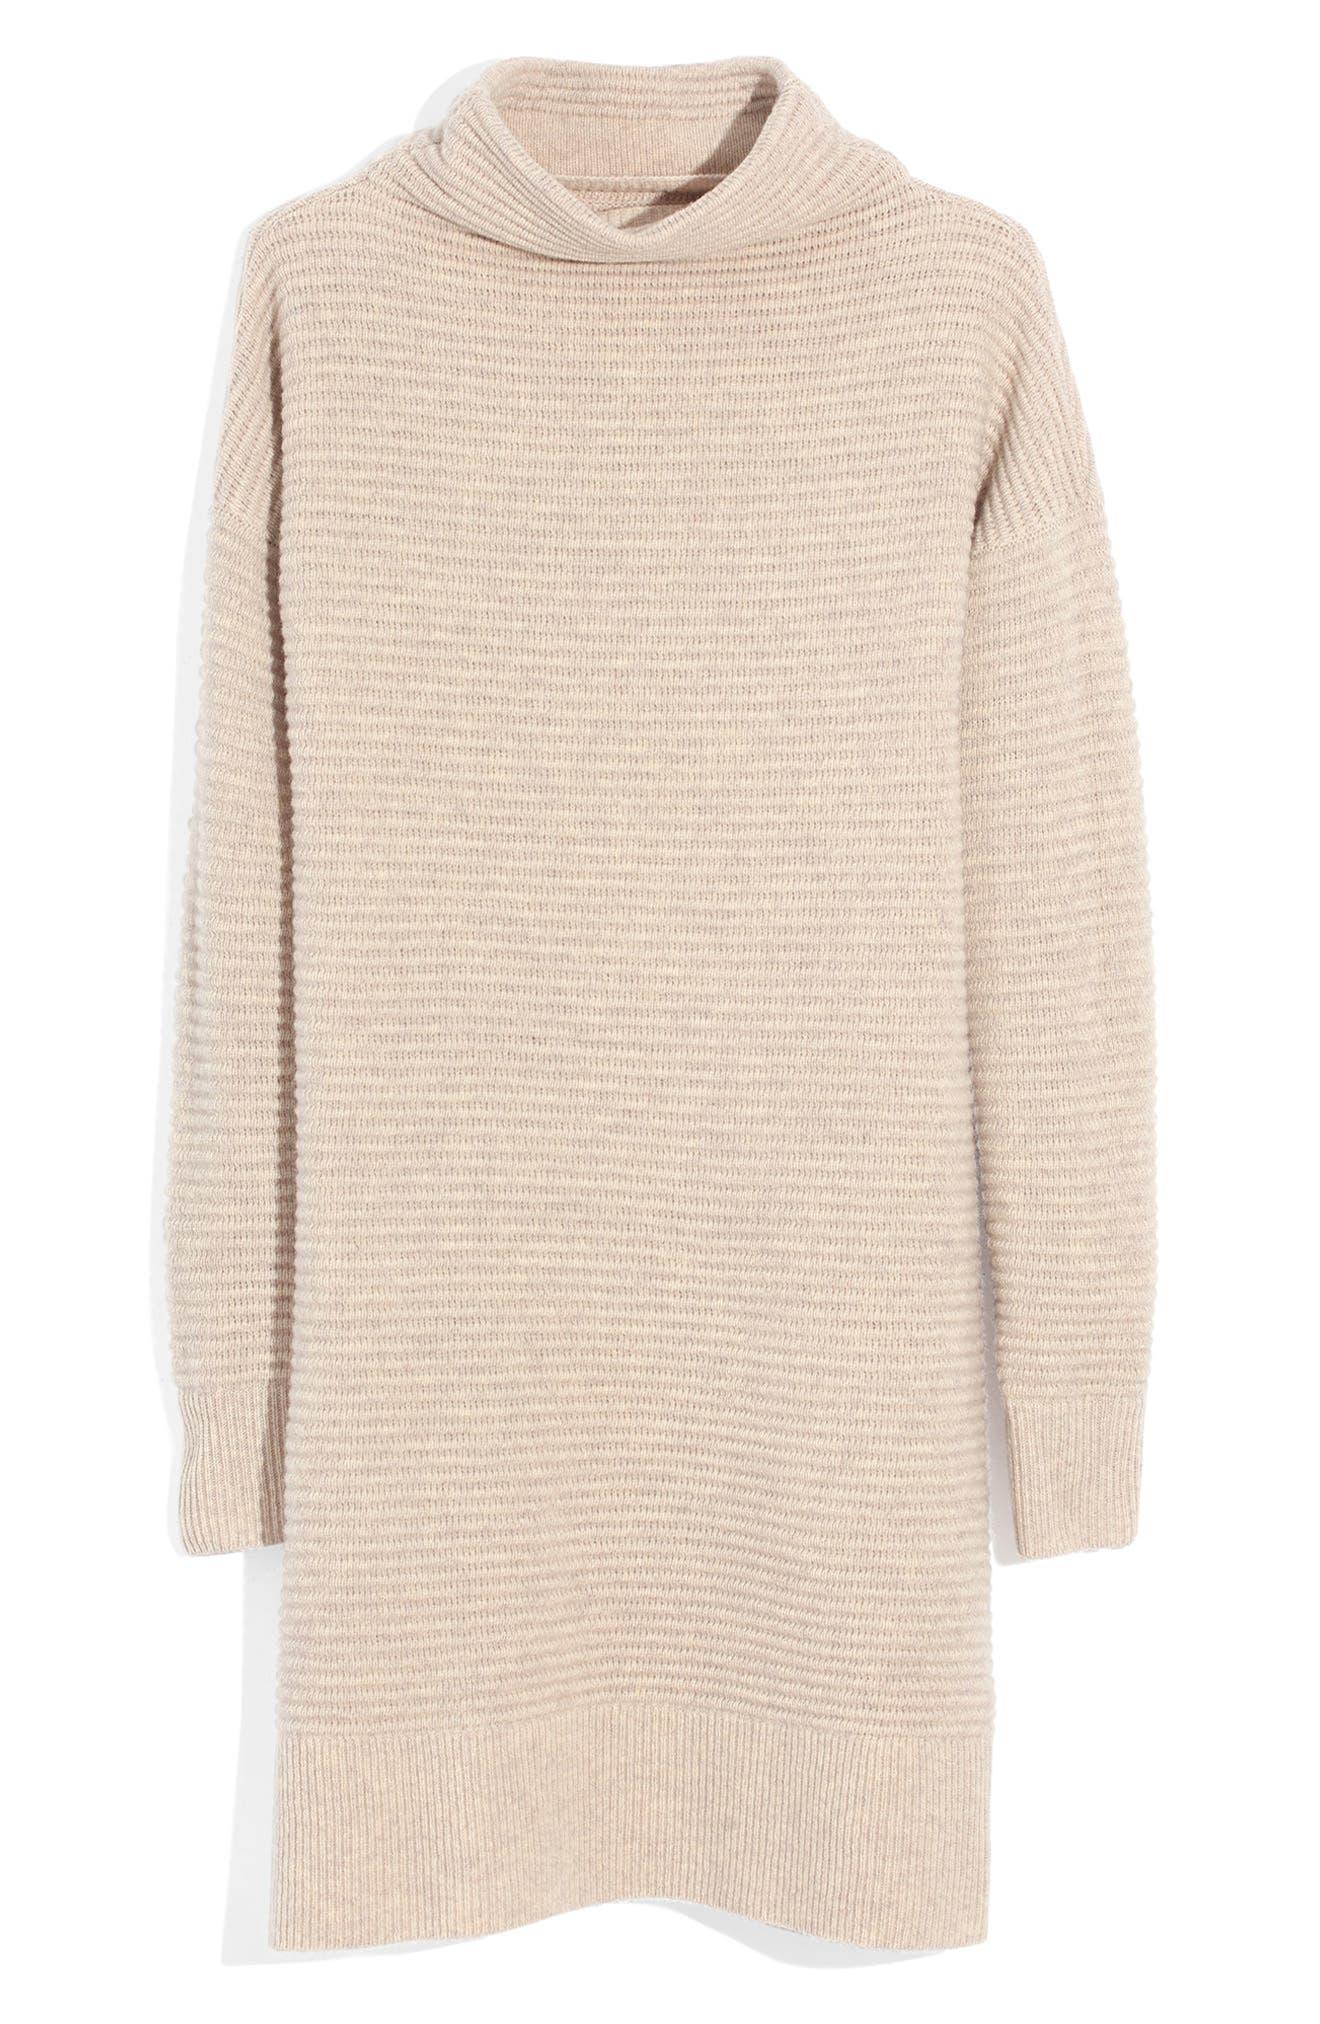 Skyscraper Merino Wool Sweater Dress,                             Alternate thumbnail 4, color,                             HEATHER ALMOND